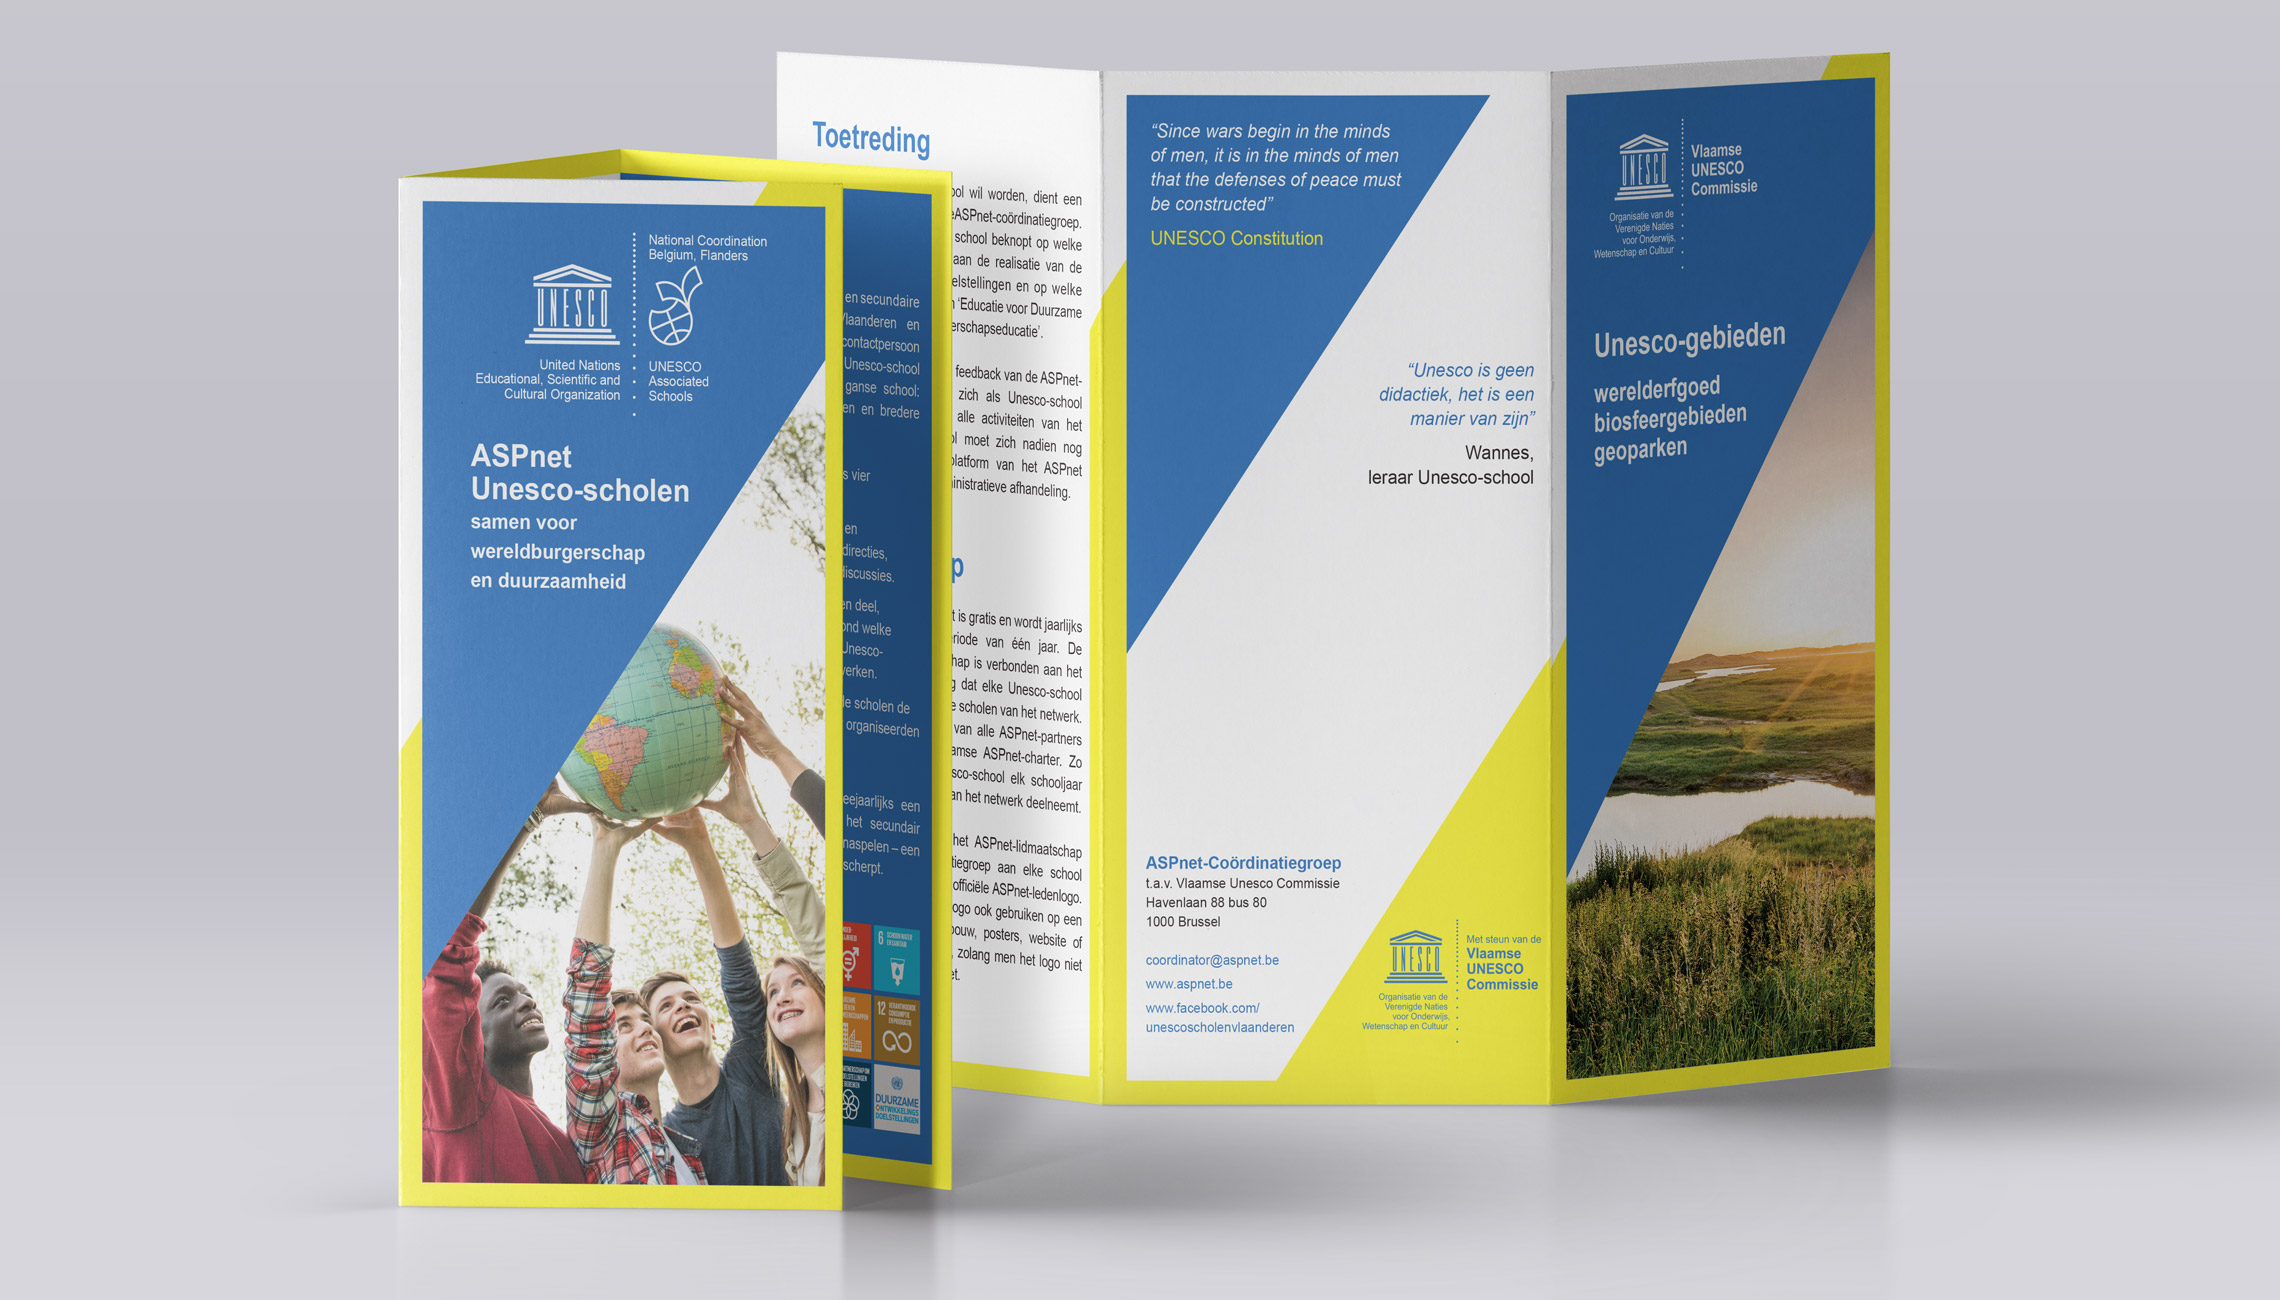 identity: Visual identity UNESCO-Flanders - image 3